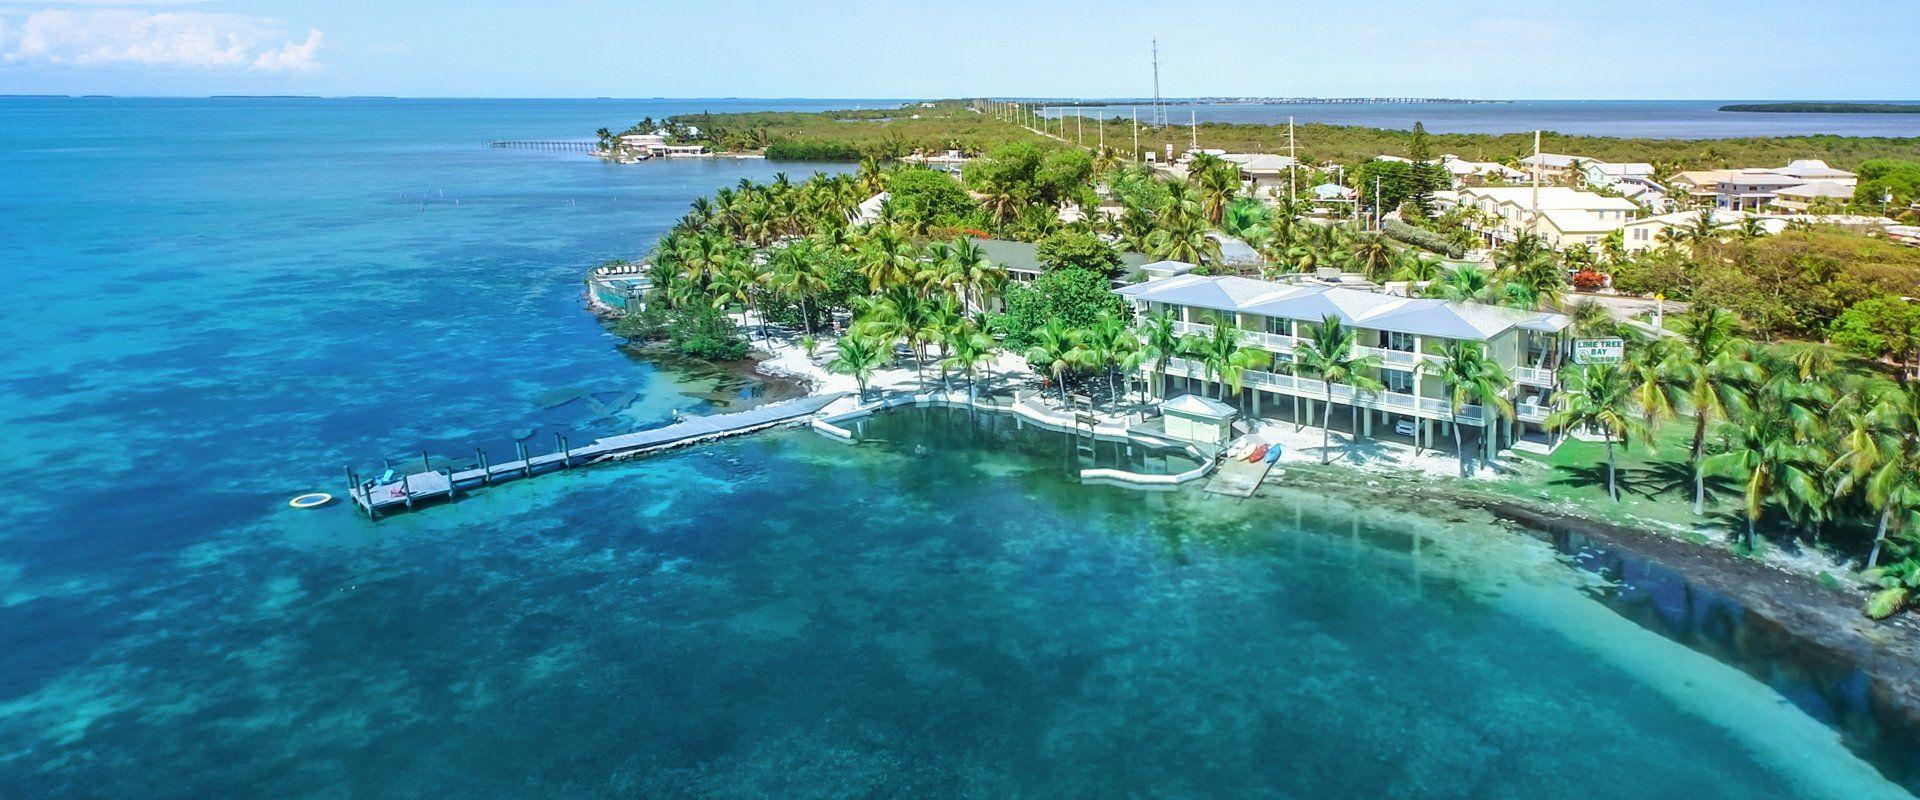 Lime Tree Bay Resort Official Site, Florida Keys Hotel